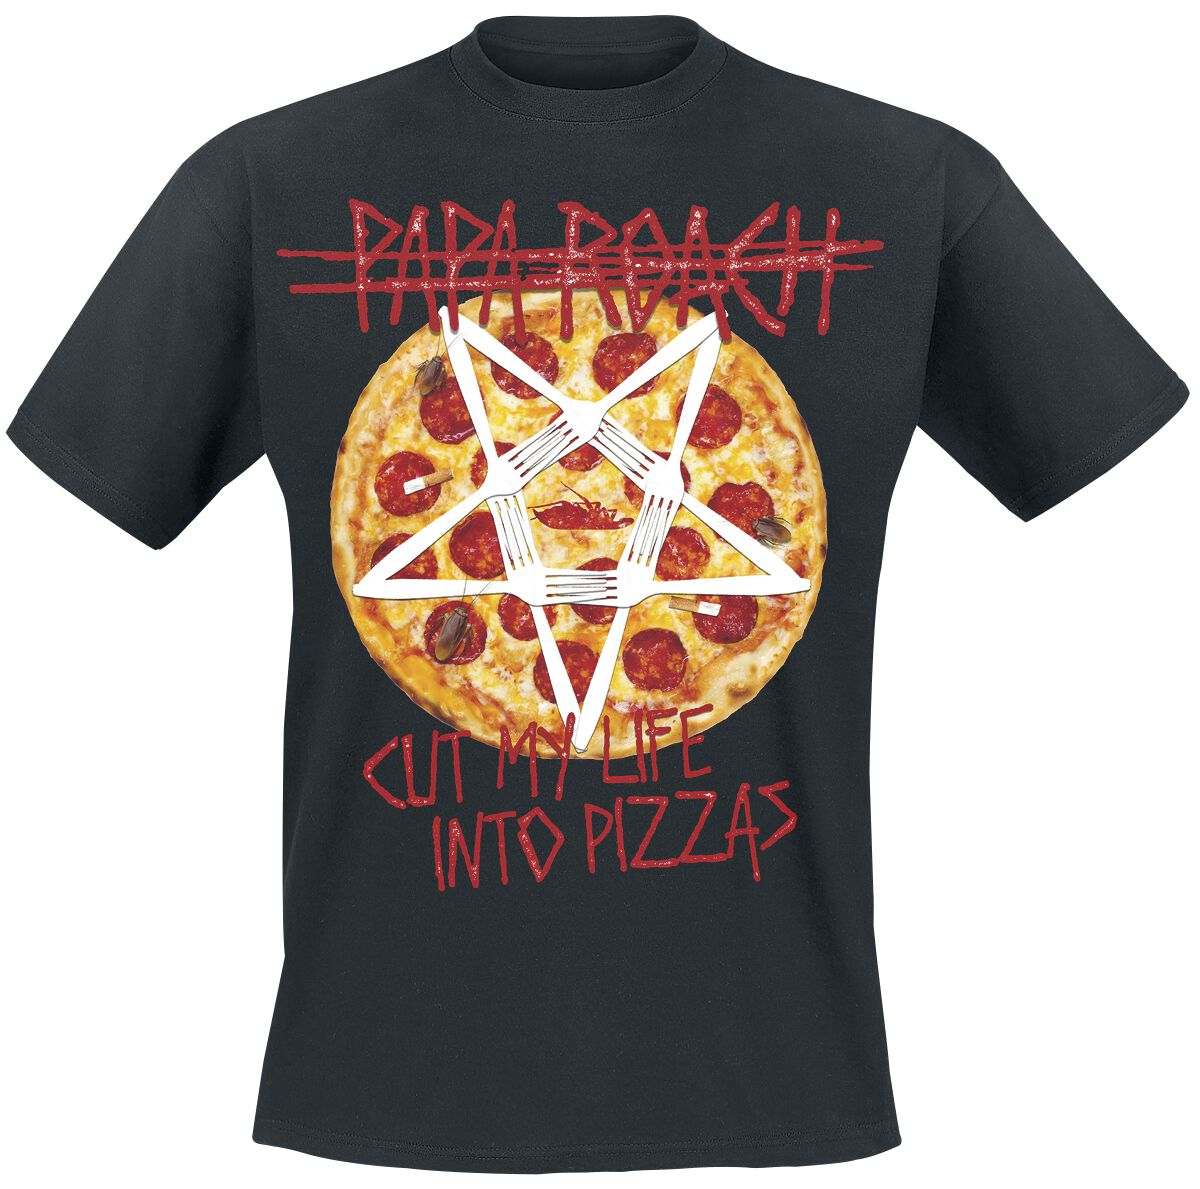 Zespoły - Koszulki - T-Shirt Papa Roach Pizza T-Shirt czarny - 377455